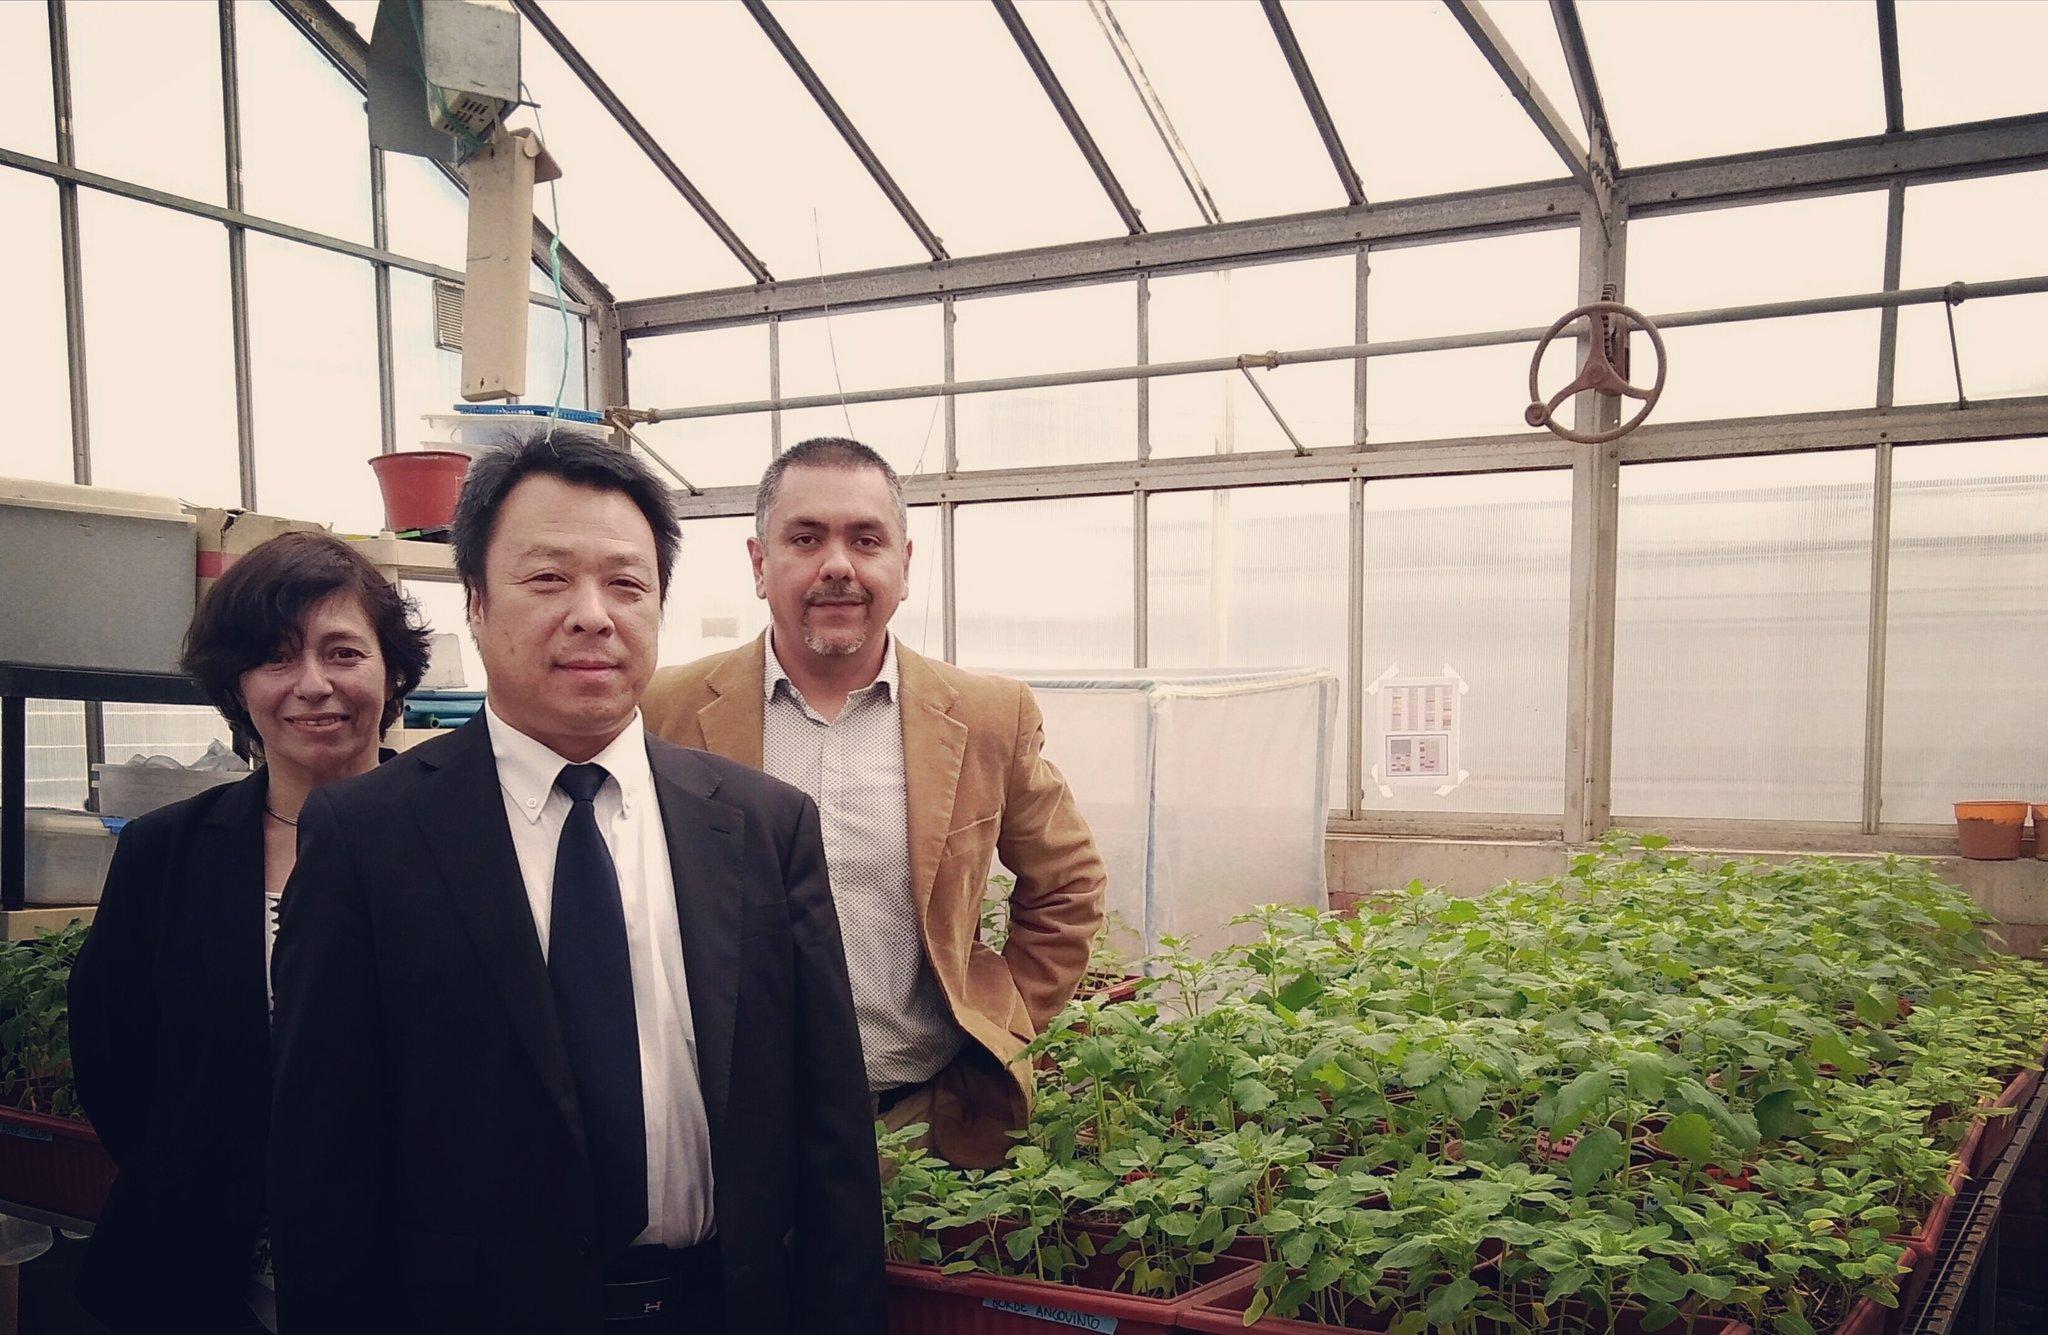 Hoy recibimos a Zhan Fu Yang de la Cámara de Comercio de #Hebei #China para compartir experiencia de I+D+i en #quinoa en la @ucatolica https://t.co/uaXWTSuIaL